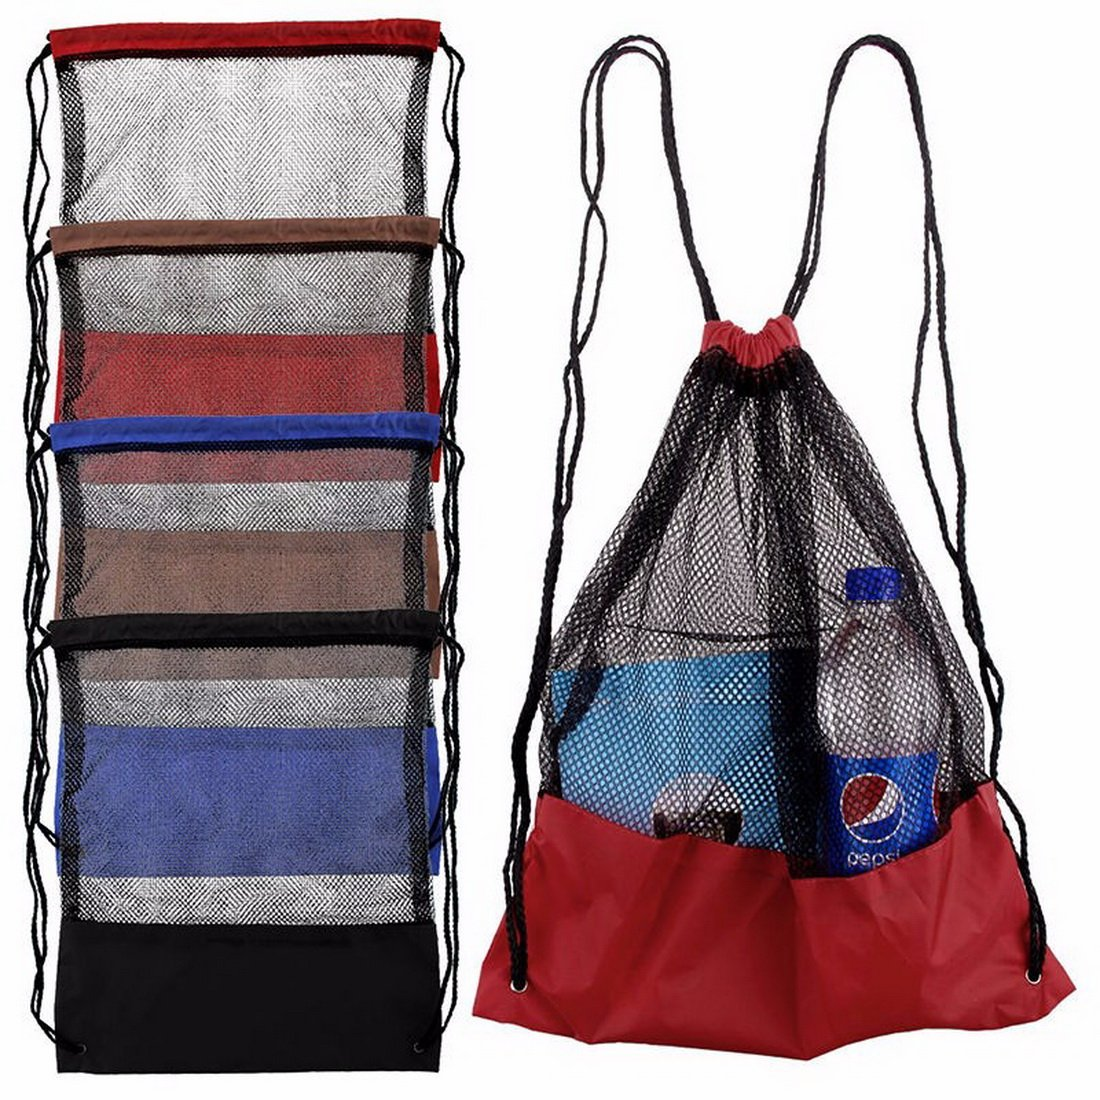 Gym Sack Drawstring Bag Set 5 Pc Tavel Backpack Camping Hiking Mesh Sackpacks